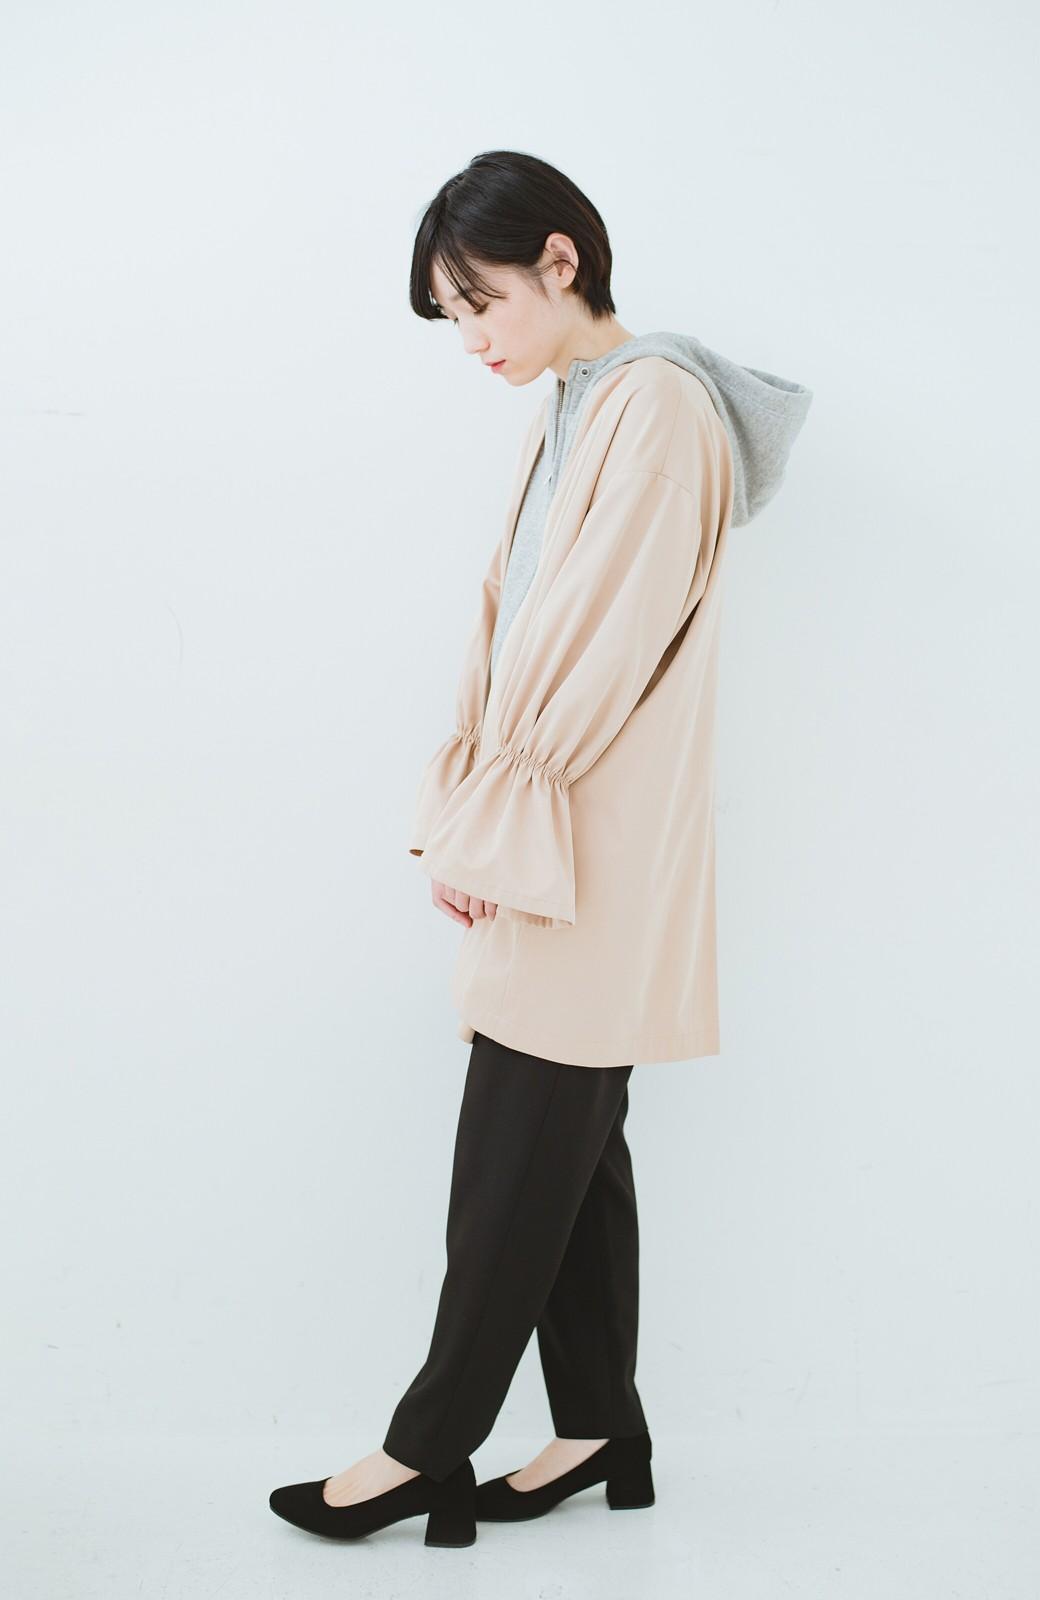 haco! ただ羽織るだけでオシャレに見える 気軽なフレアースリーブコート <ベージュ>の商品写真7